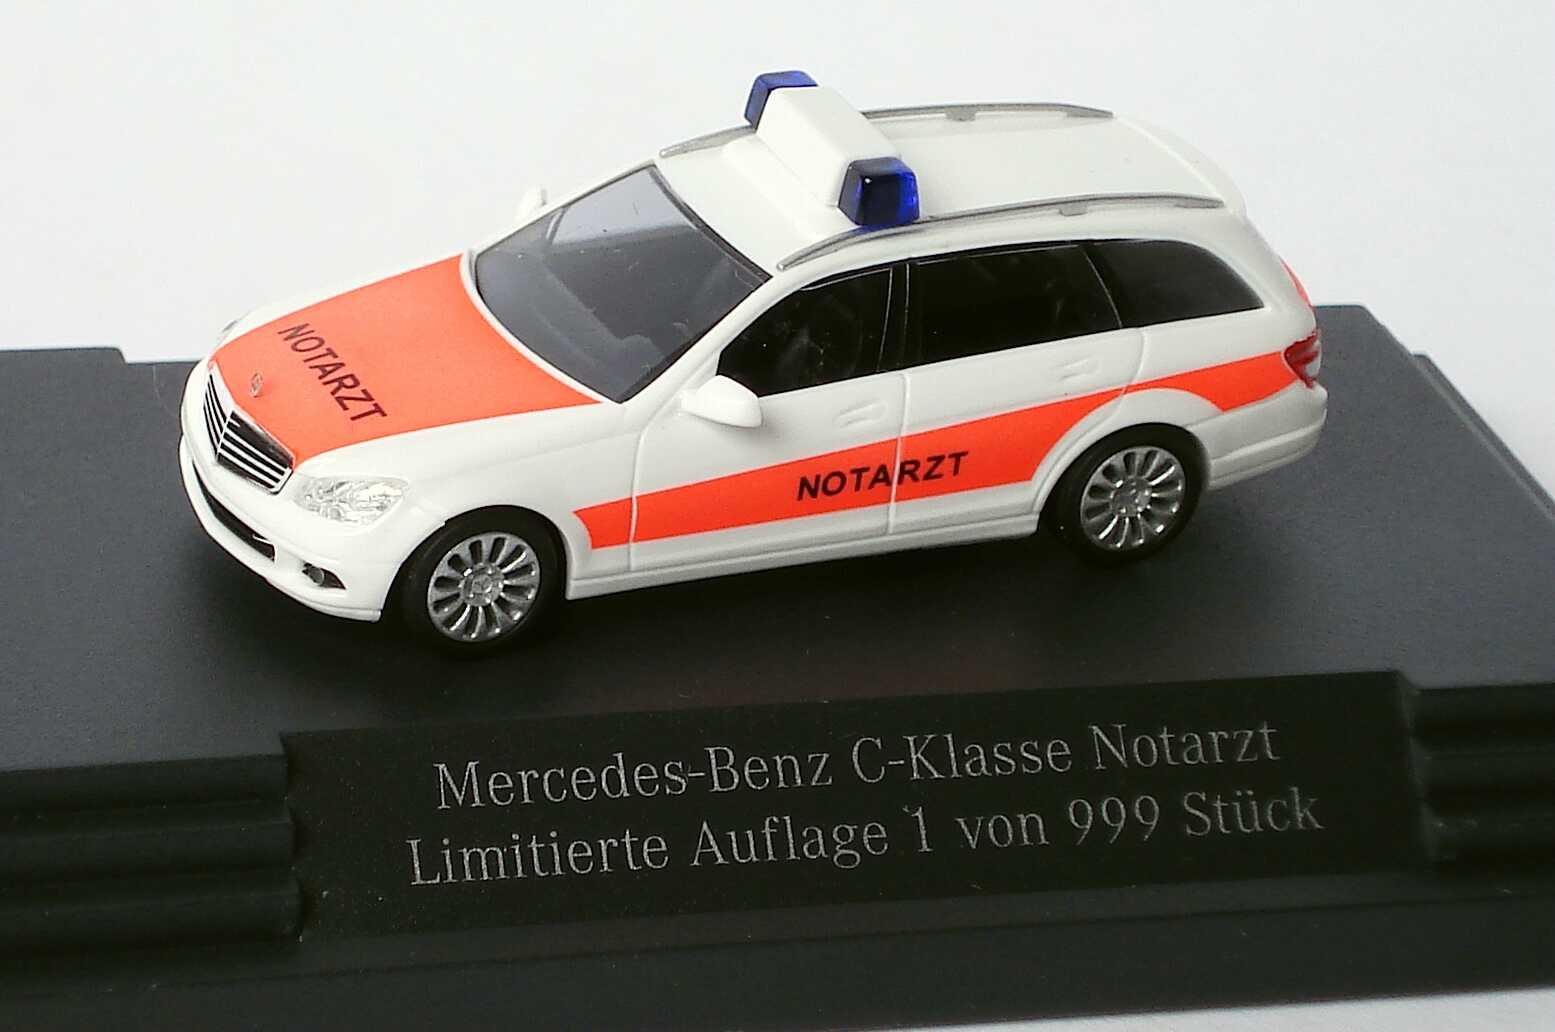 1:87 Mercedes-Benz C-Klasse T-Modell Elegance (S204) Notarzt (MB)